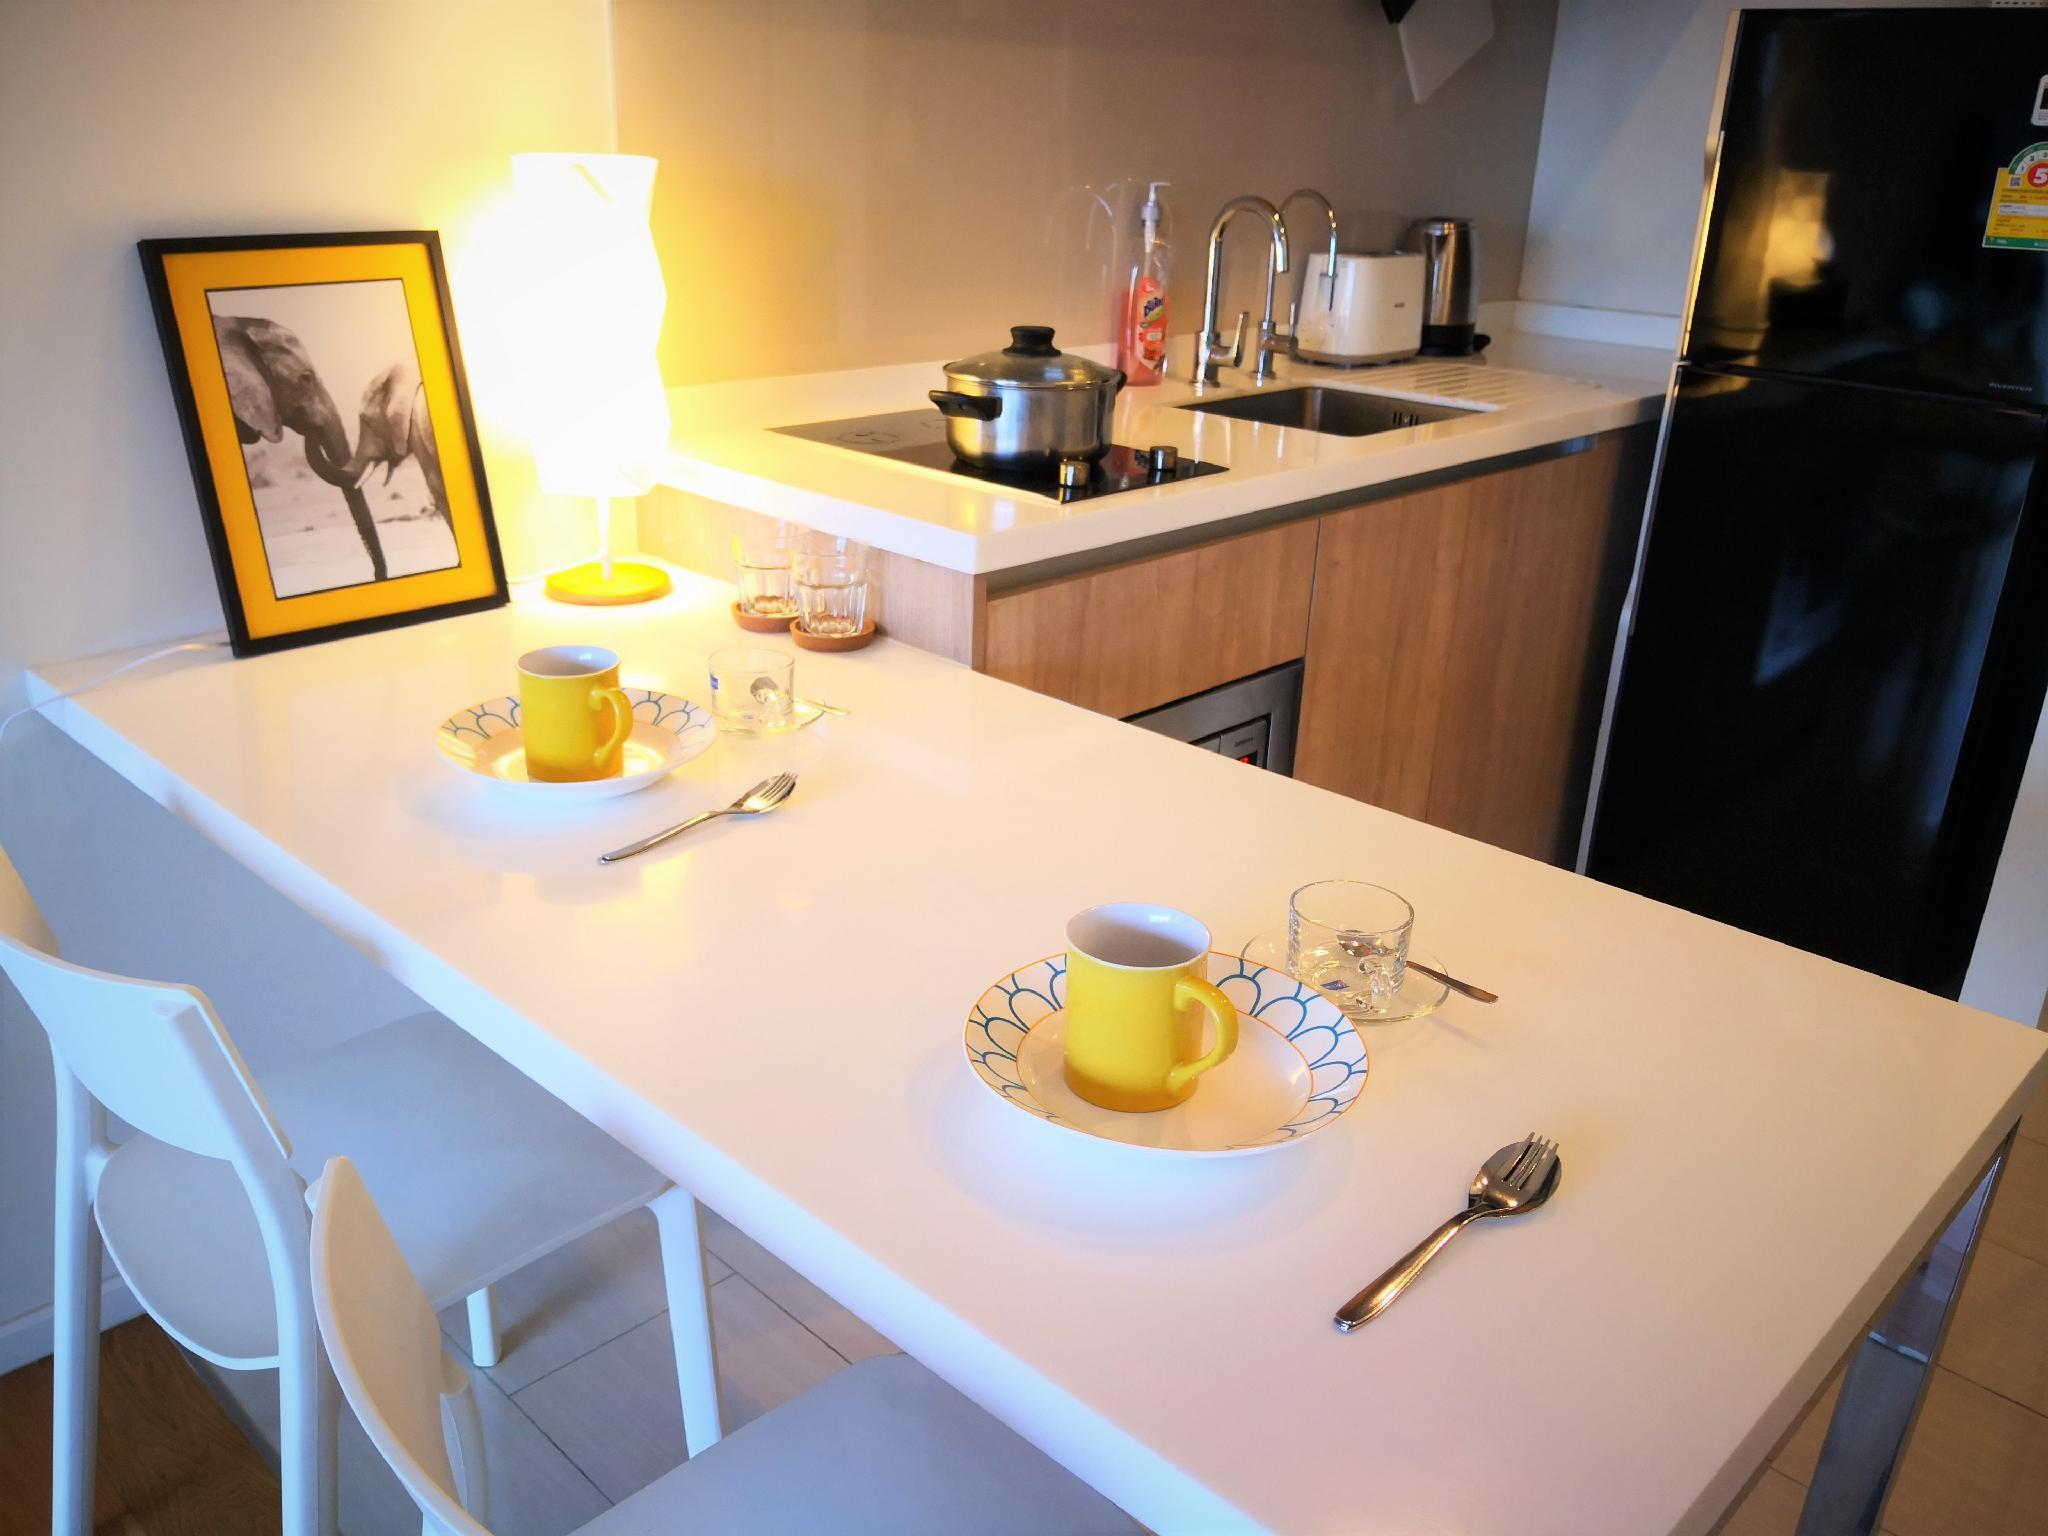 landscape luxury condo MRT500meters BKK citycenter อพาร์ตเมนต์ 1 ห้องนอน 1 ห้องน้ำส่วนตัว ขนาด 48 ตร.ม. – สุขุมวิท